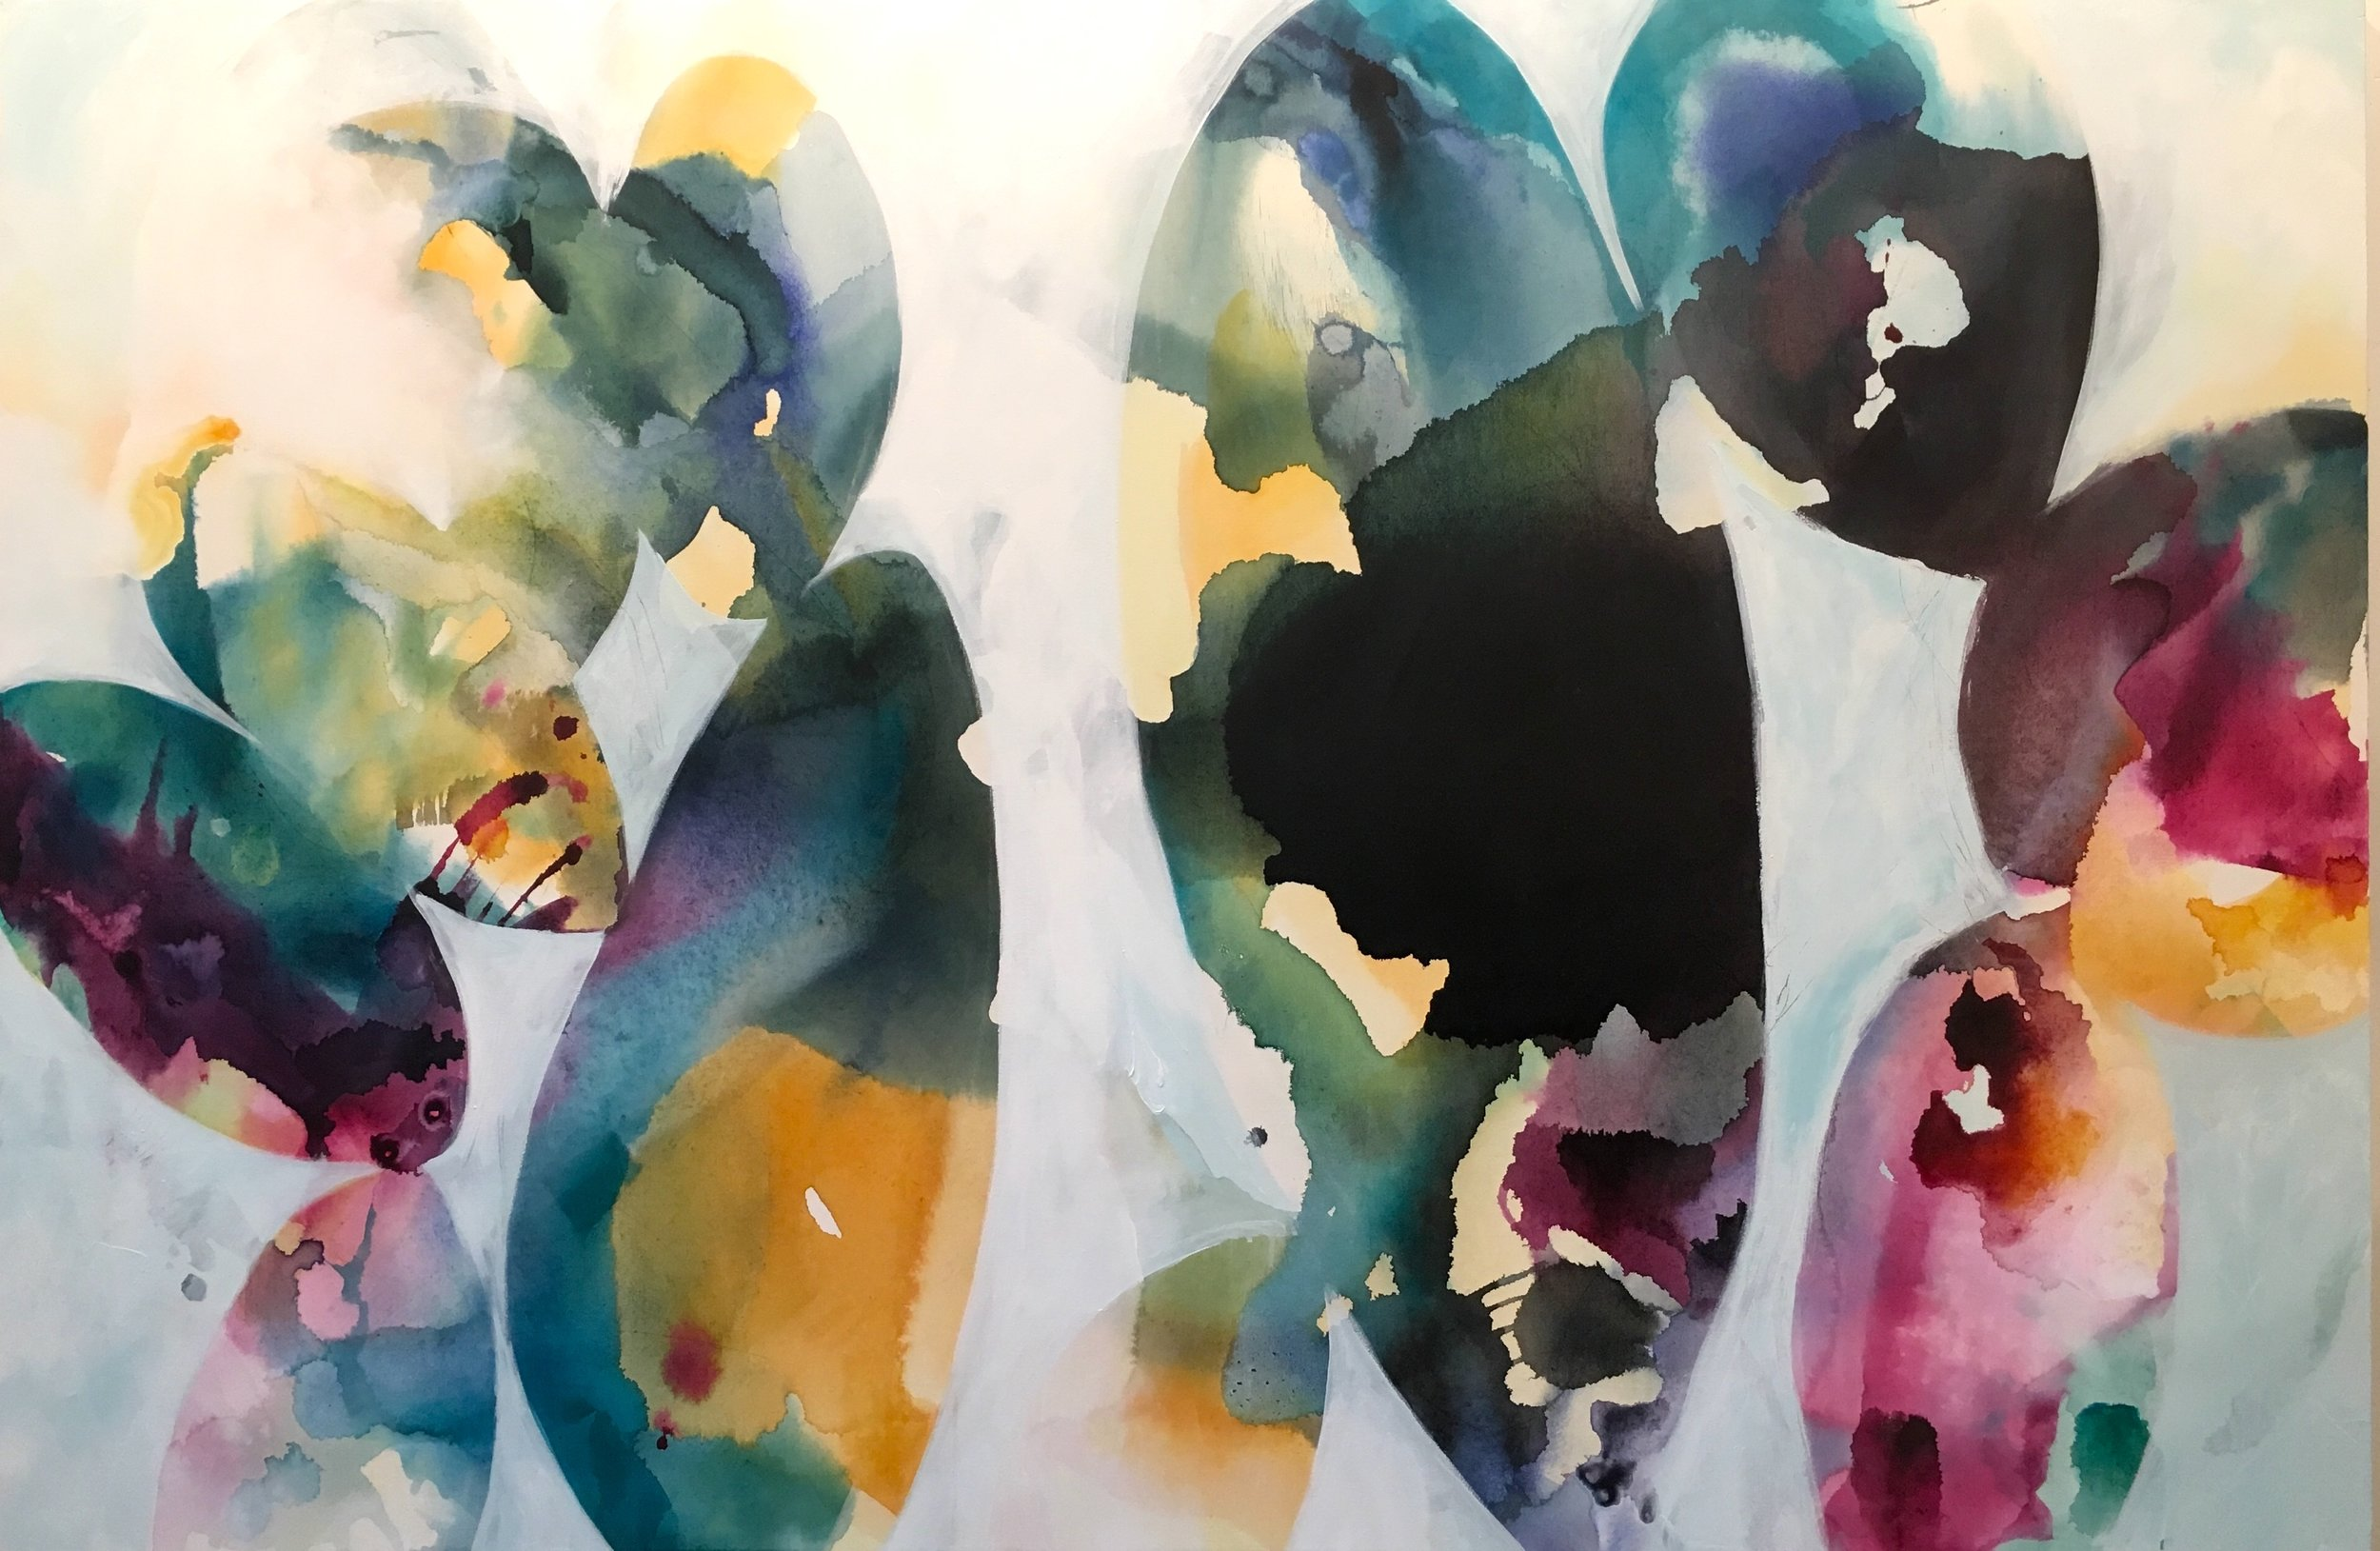 """sky full of song"", acrylic on canvas, 40"" x 60"""